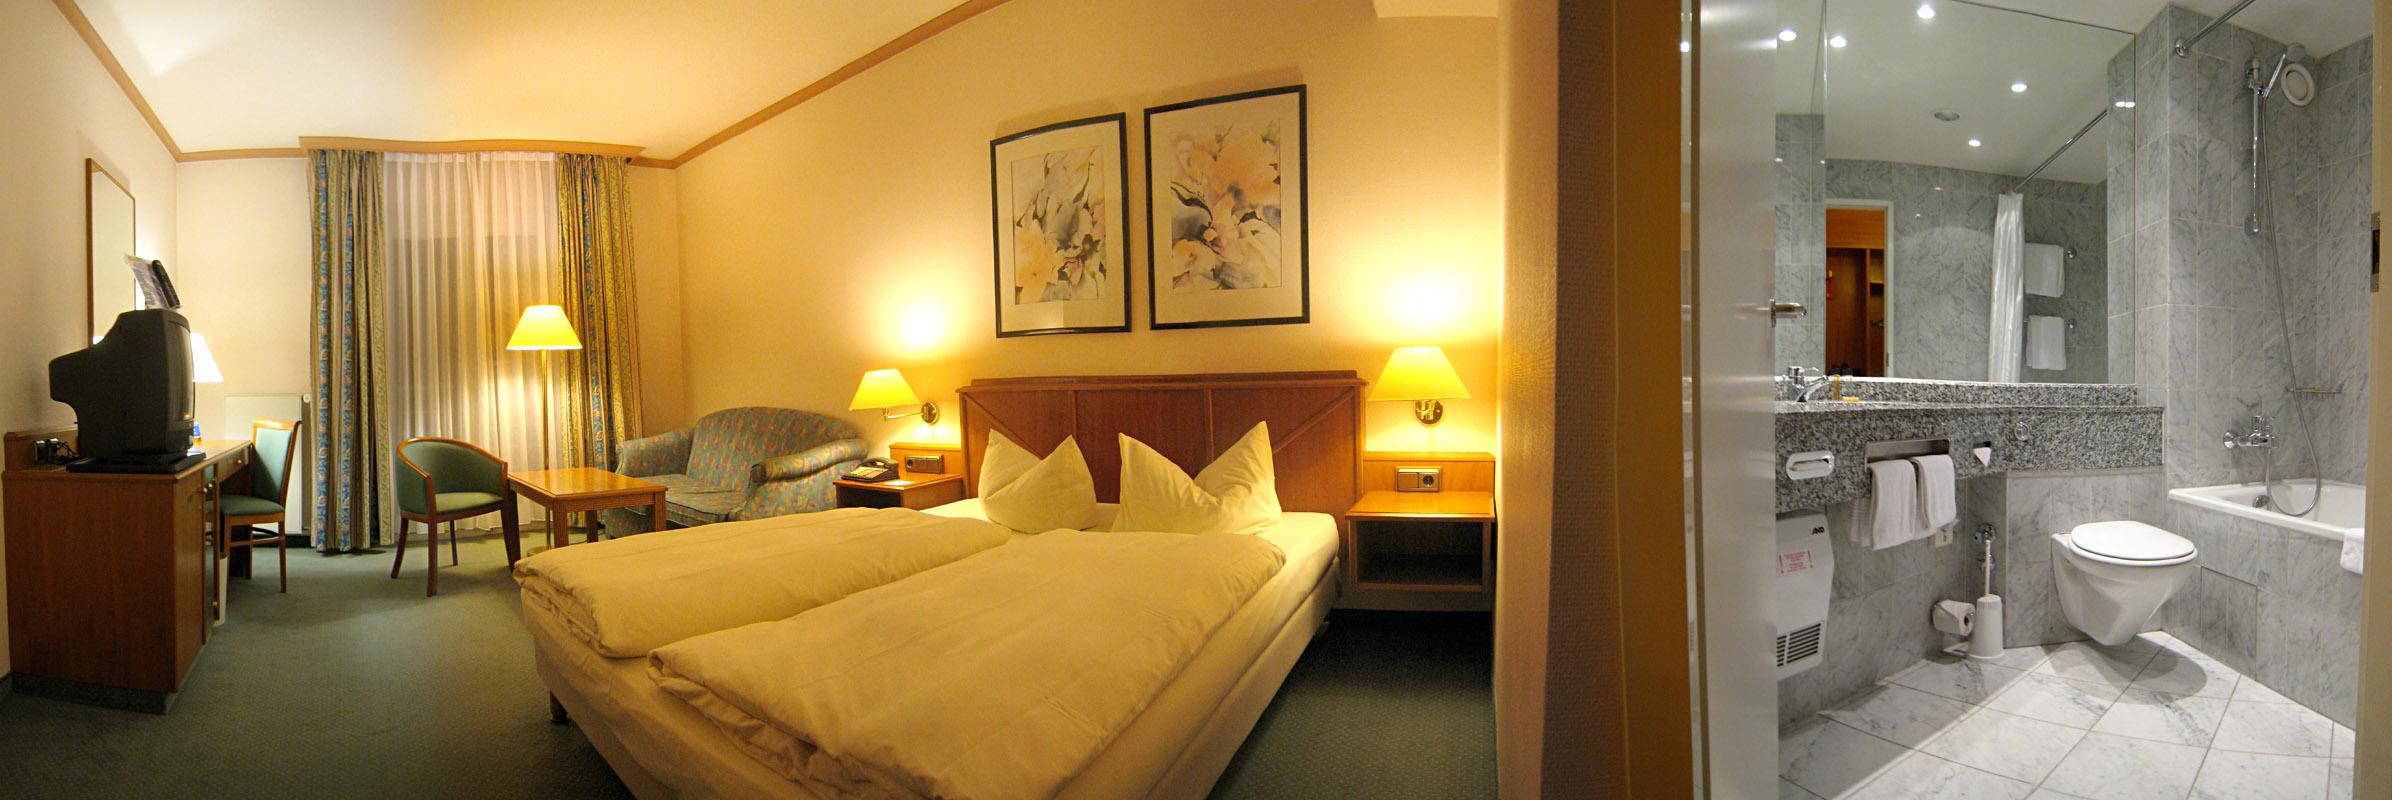 penta hotel braunschweig tour blog. Black Bedroom Furniture Sets. Home Design Ideas